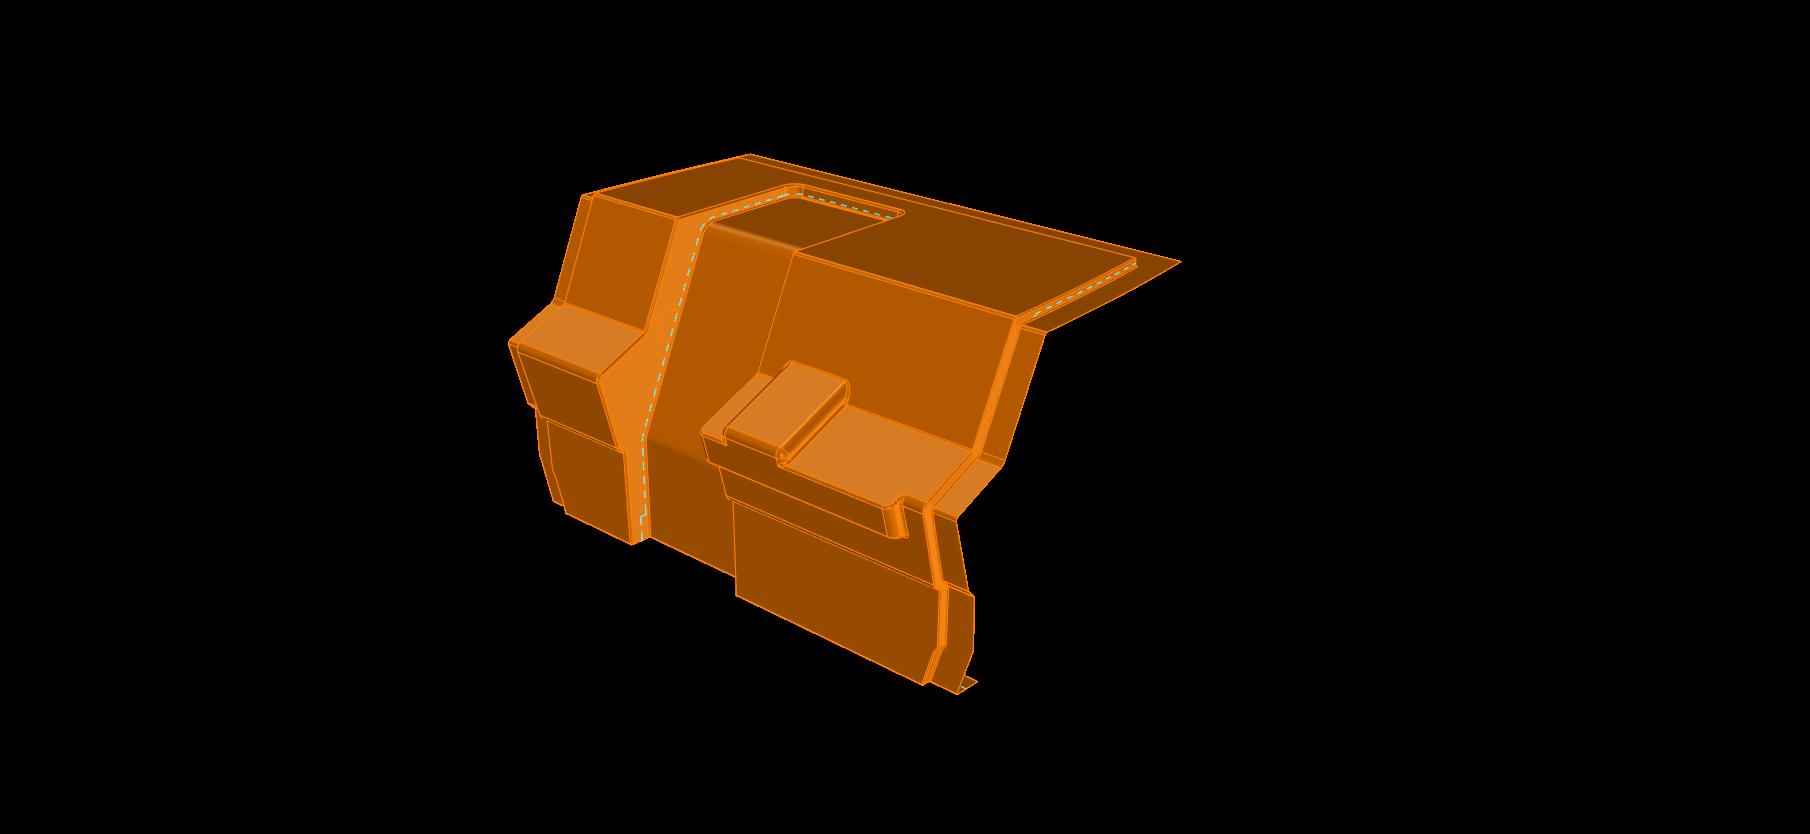 52' Center Console | Helm Shroud